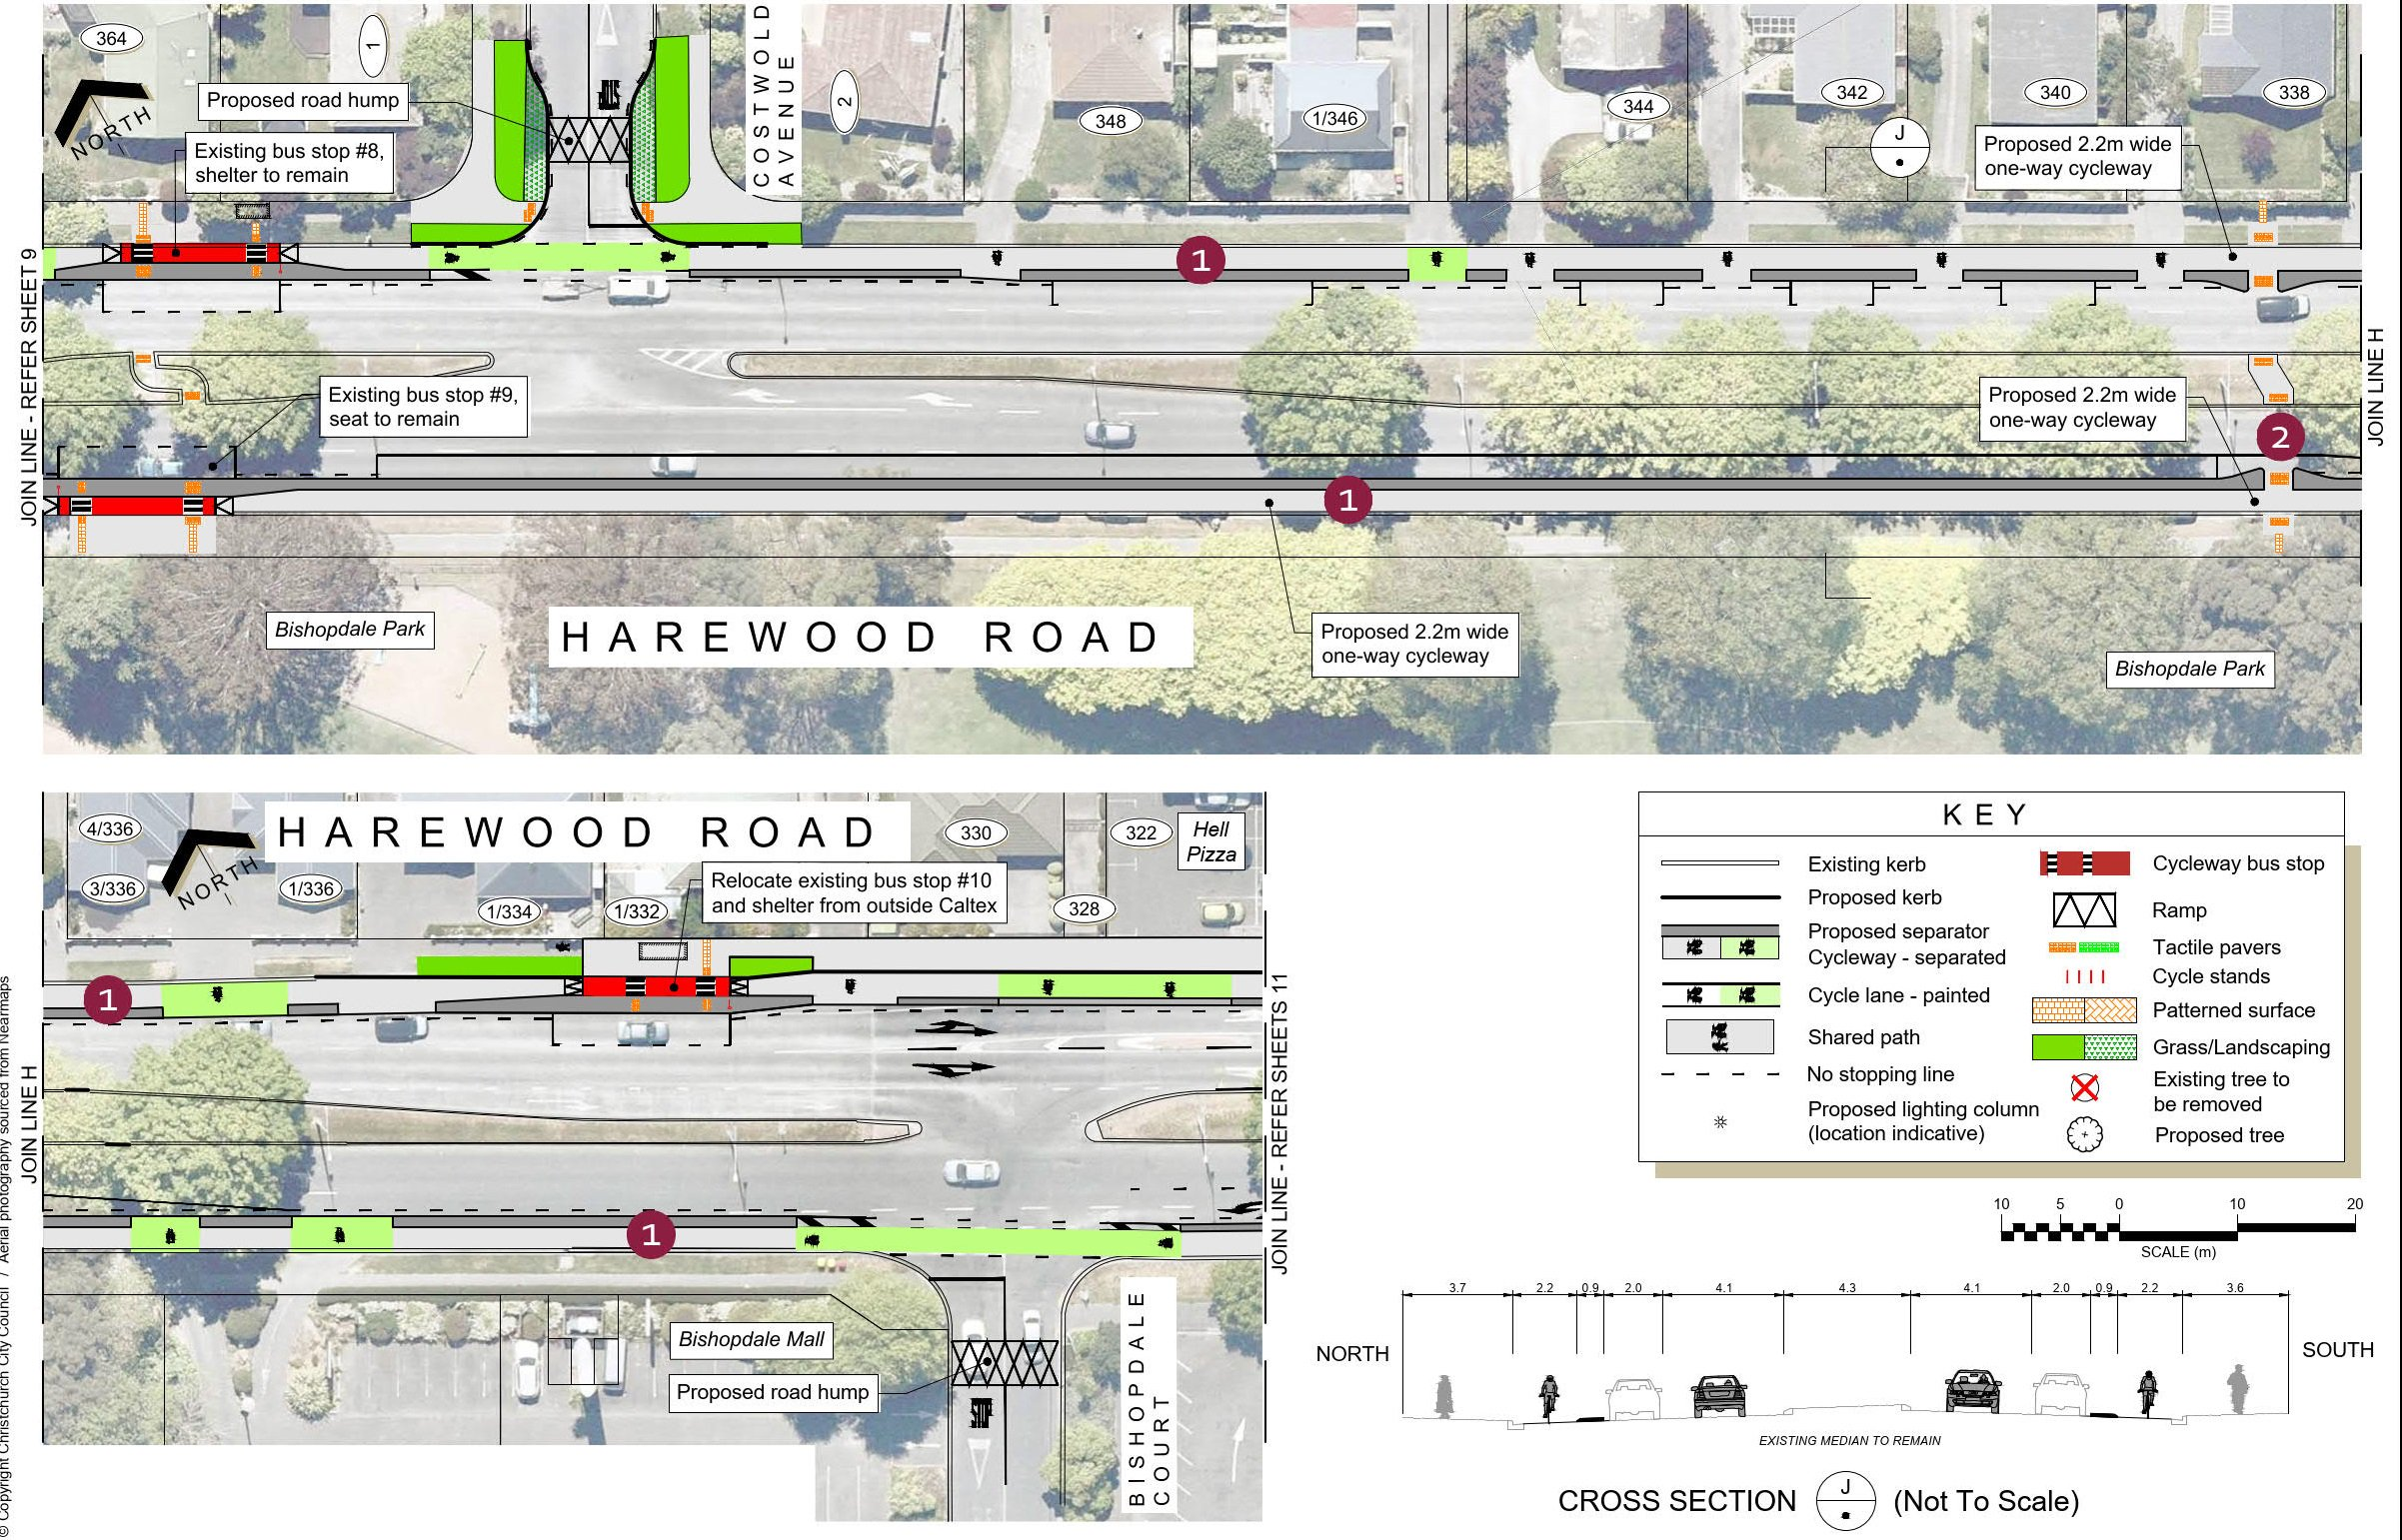 Plan 10 - 364 to 322 Harewood Road